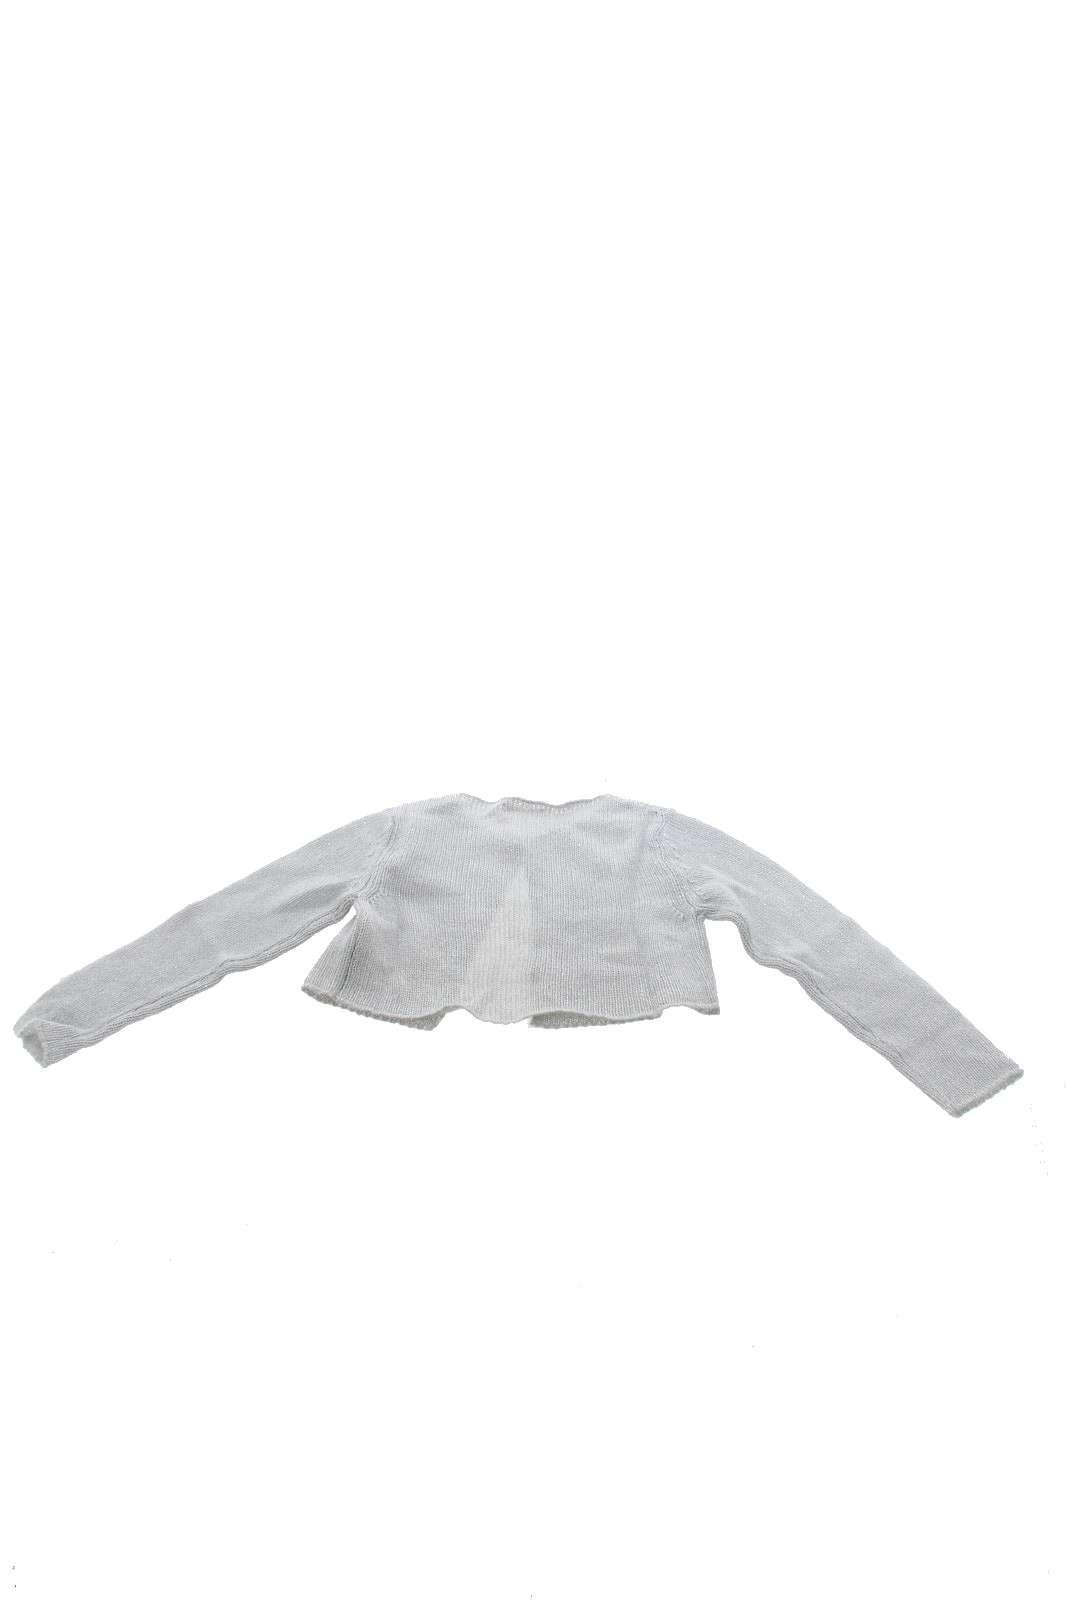 https://www.parmax.com/media/catalog/product/a/i/AI-outlet_parmax-maglia-bambina-Liu%20Jo-k67133-B.jpg